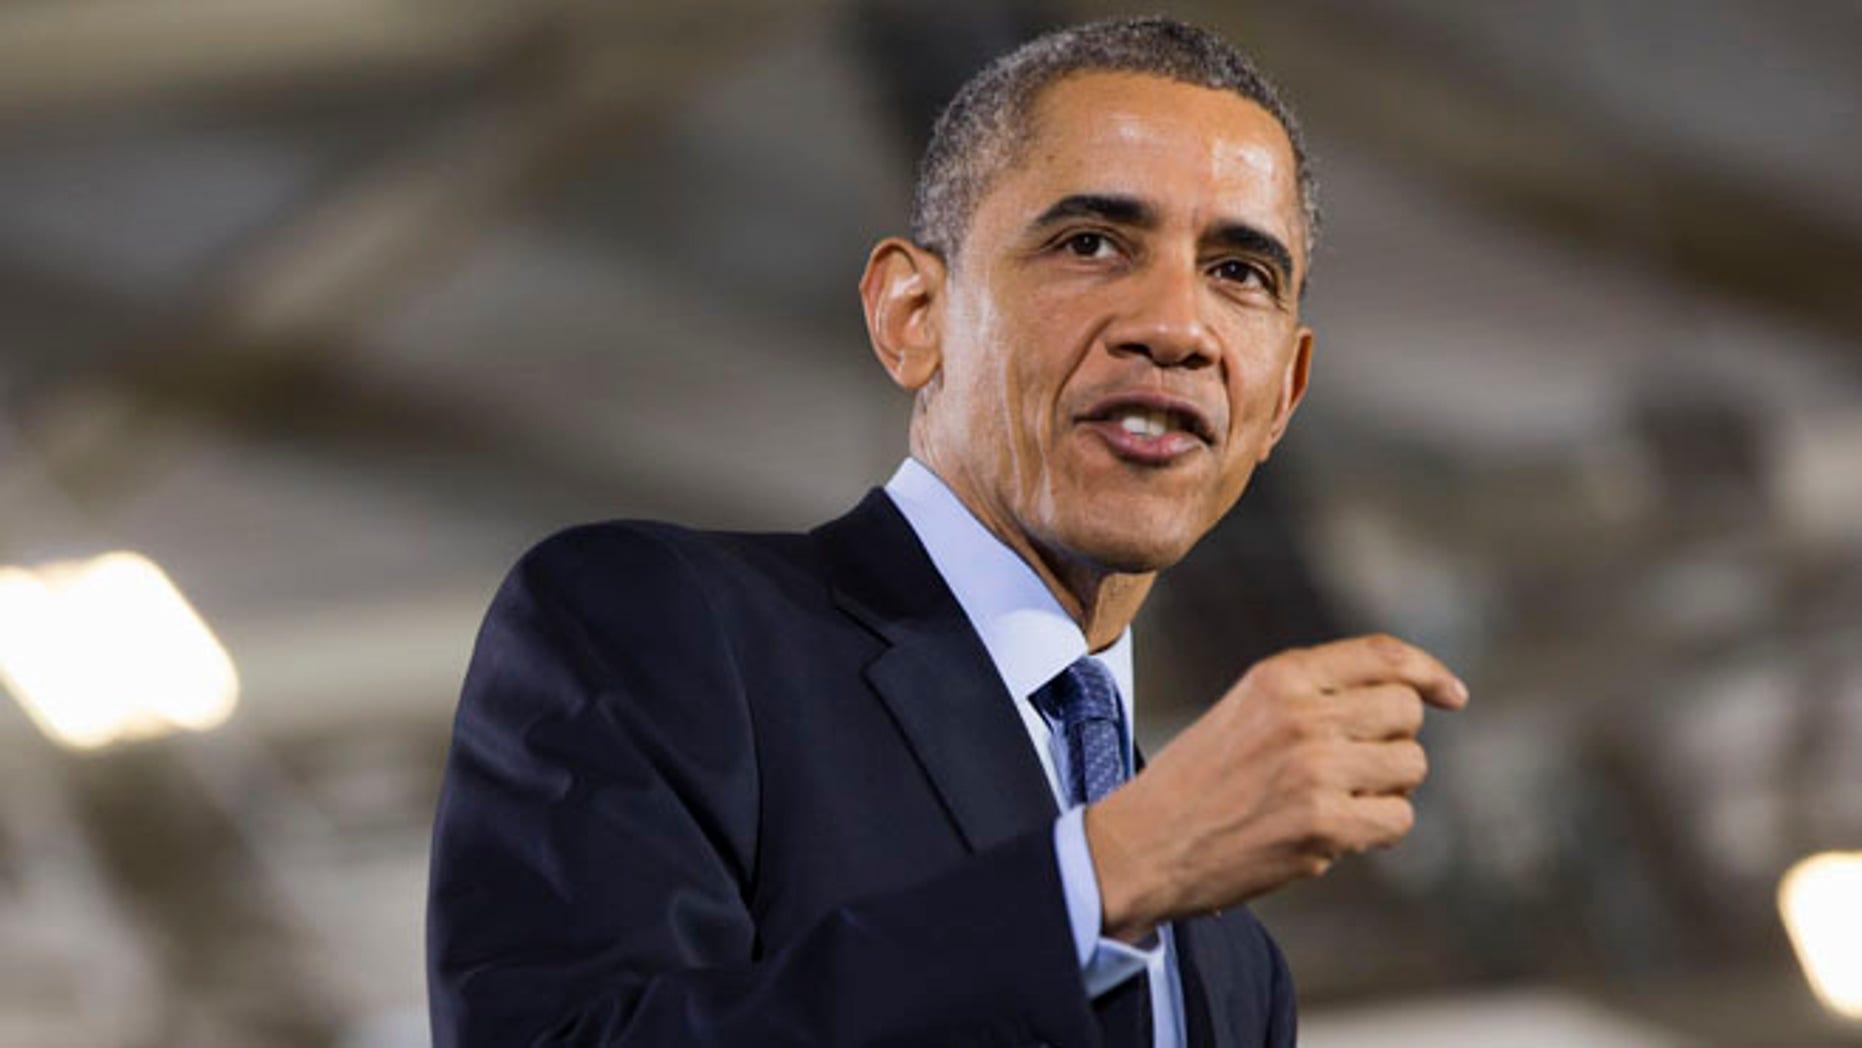 Dec. 15, 2014: Obama speaks to troops at Joint Base McGuire-Dix-Lakehurst, N.J.